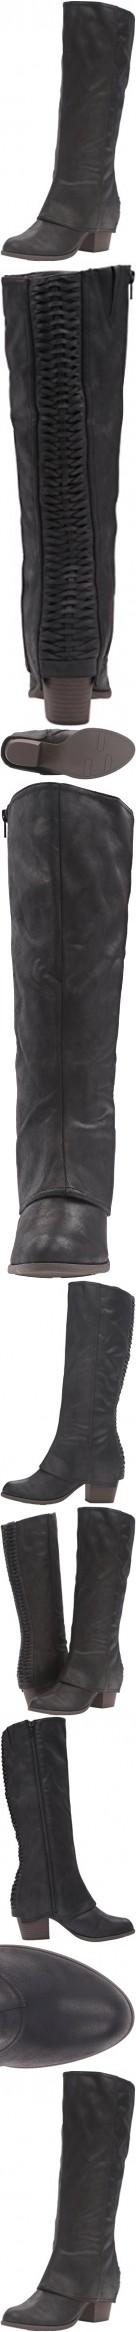 Fergalicious Women's Lundry Western Boot, Black, 6.5 M US